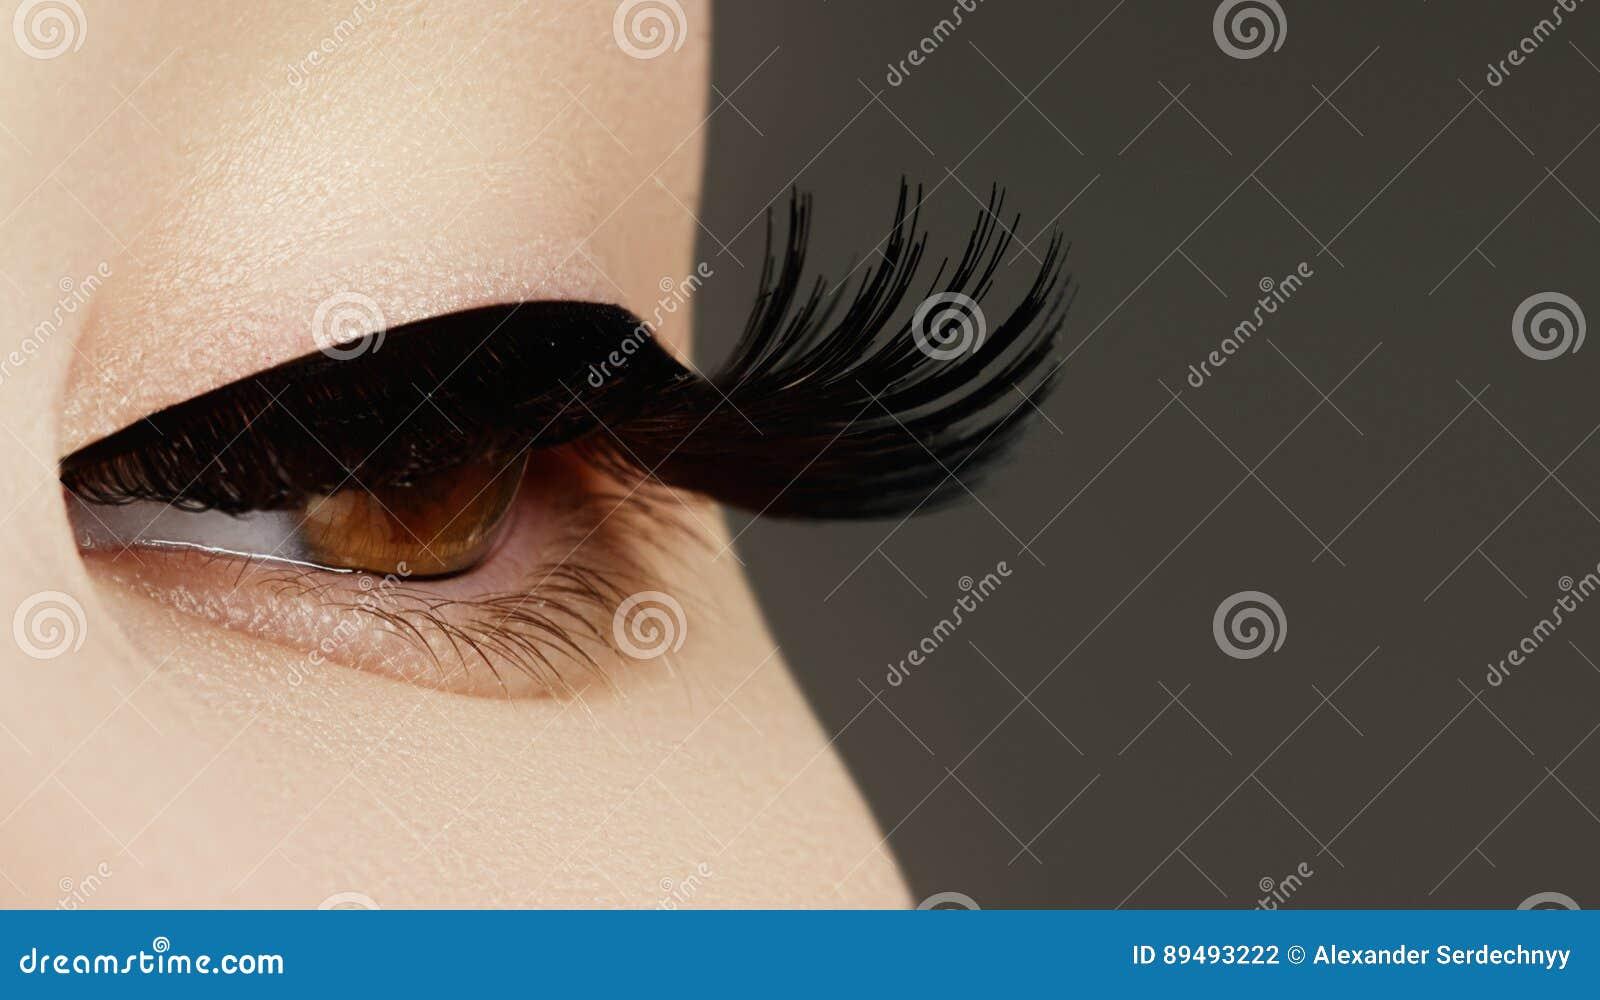 4fa58b99c5e Beauty face makeup. Make up. Eyelashes extensions. Perfect Make-up closeup.  Beauty model with perfect skin. Woman eye with long eyelashes. Eyelash  extension